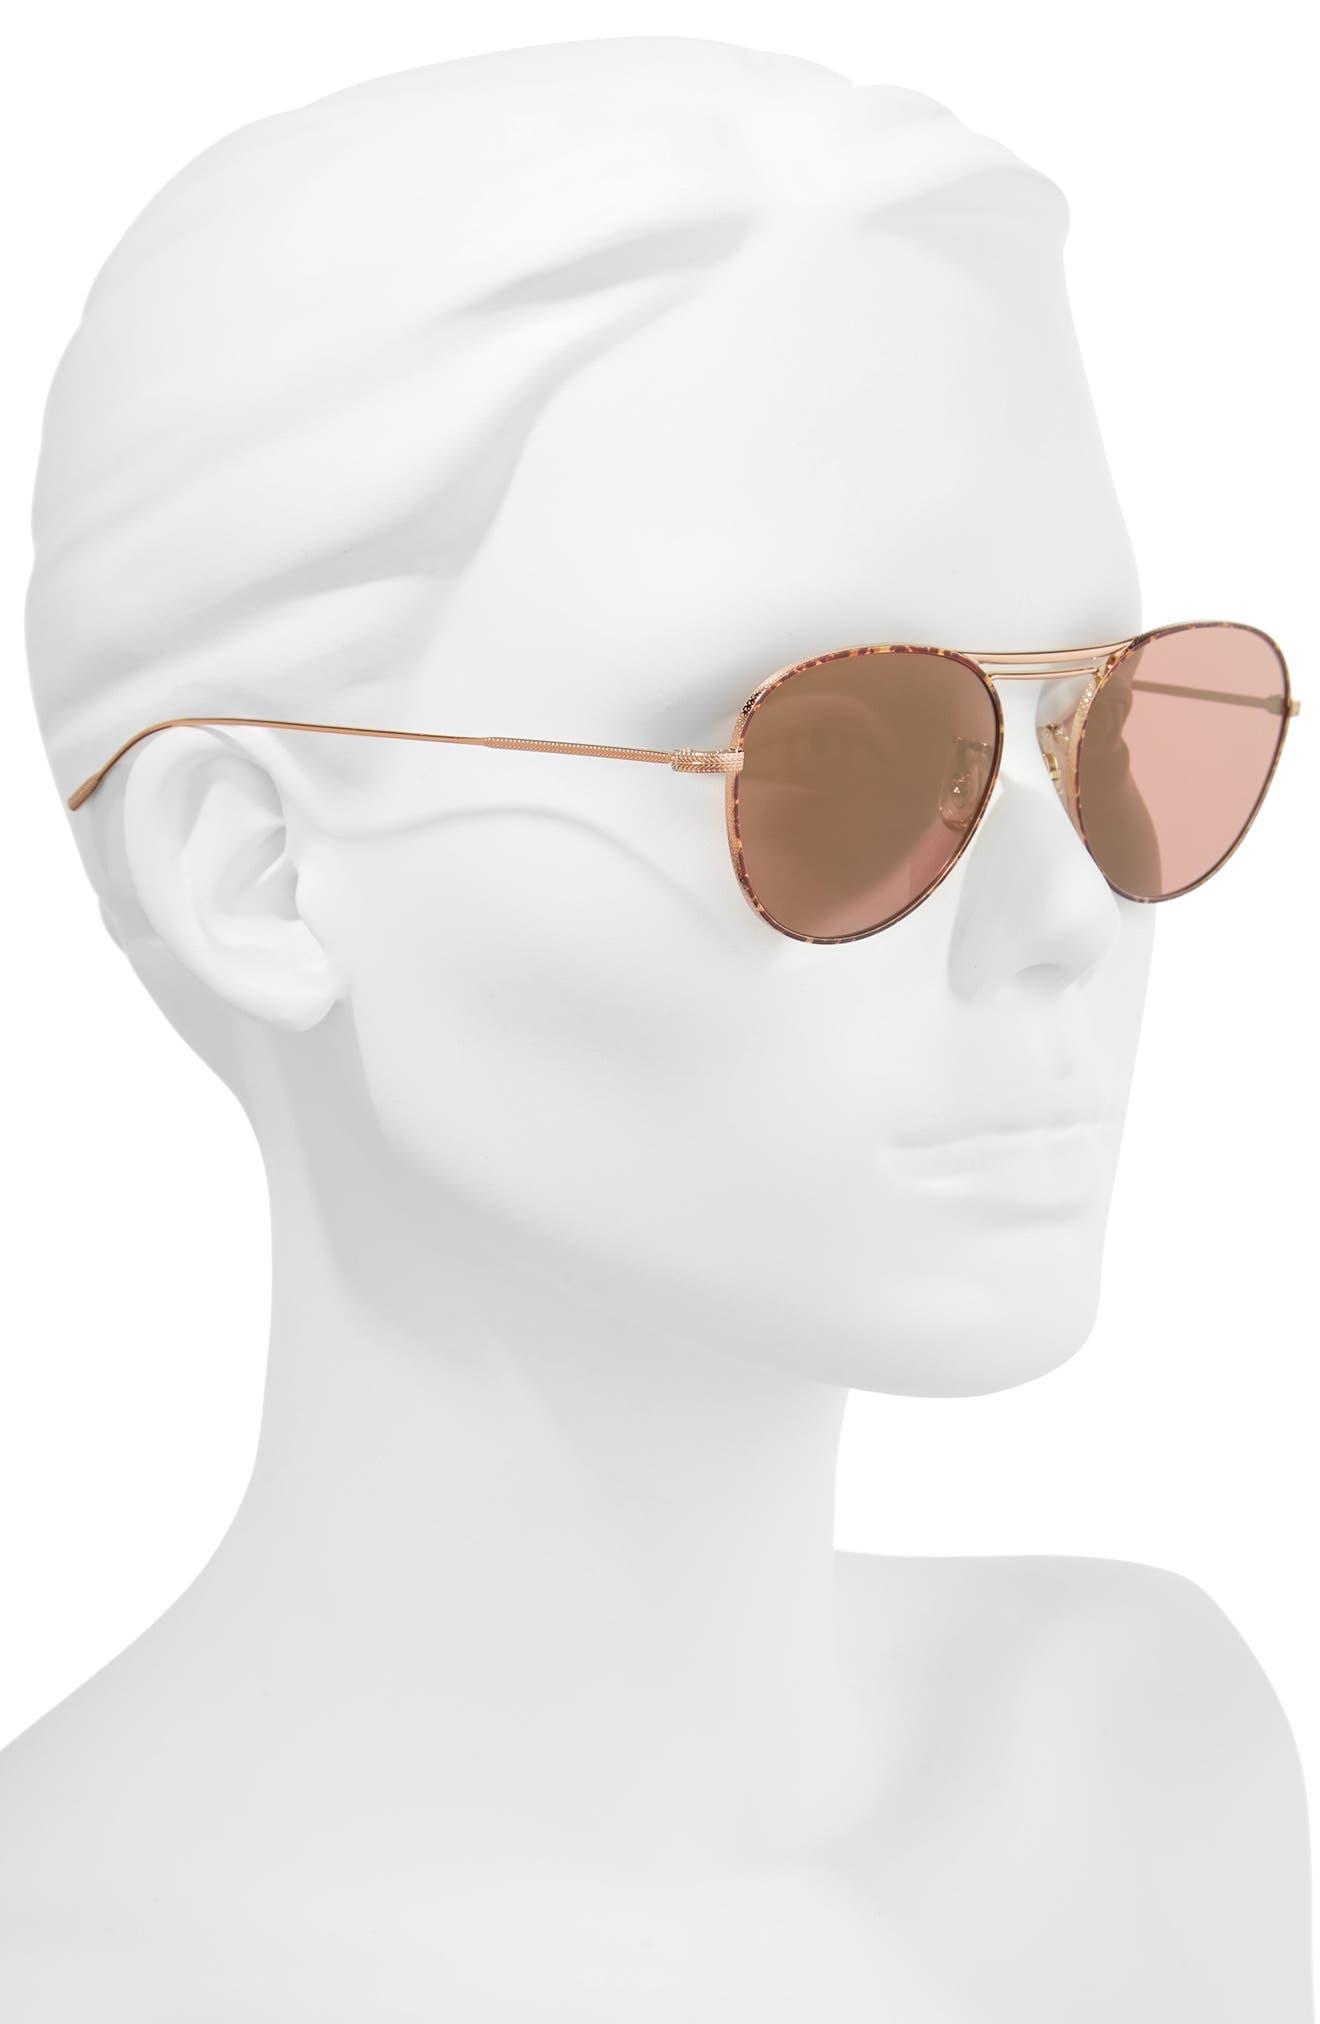 Cade 52mm Mirror Lens Aviator Sunglasses,                             Alternate thumbnail 3, color,                             Burgundy